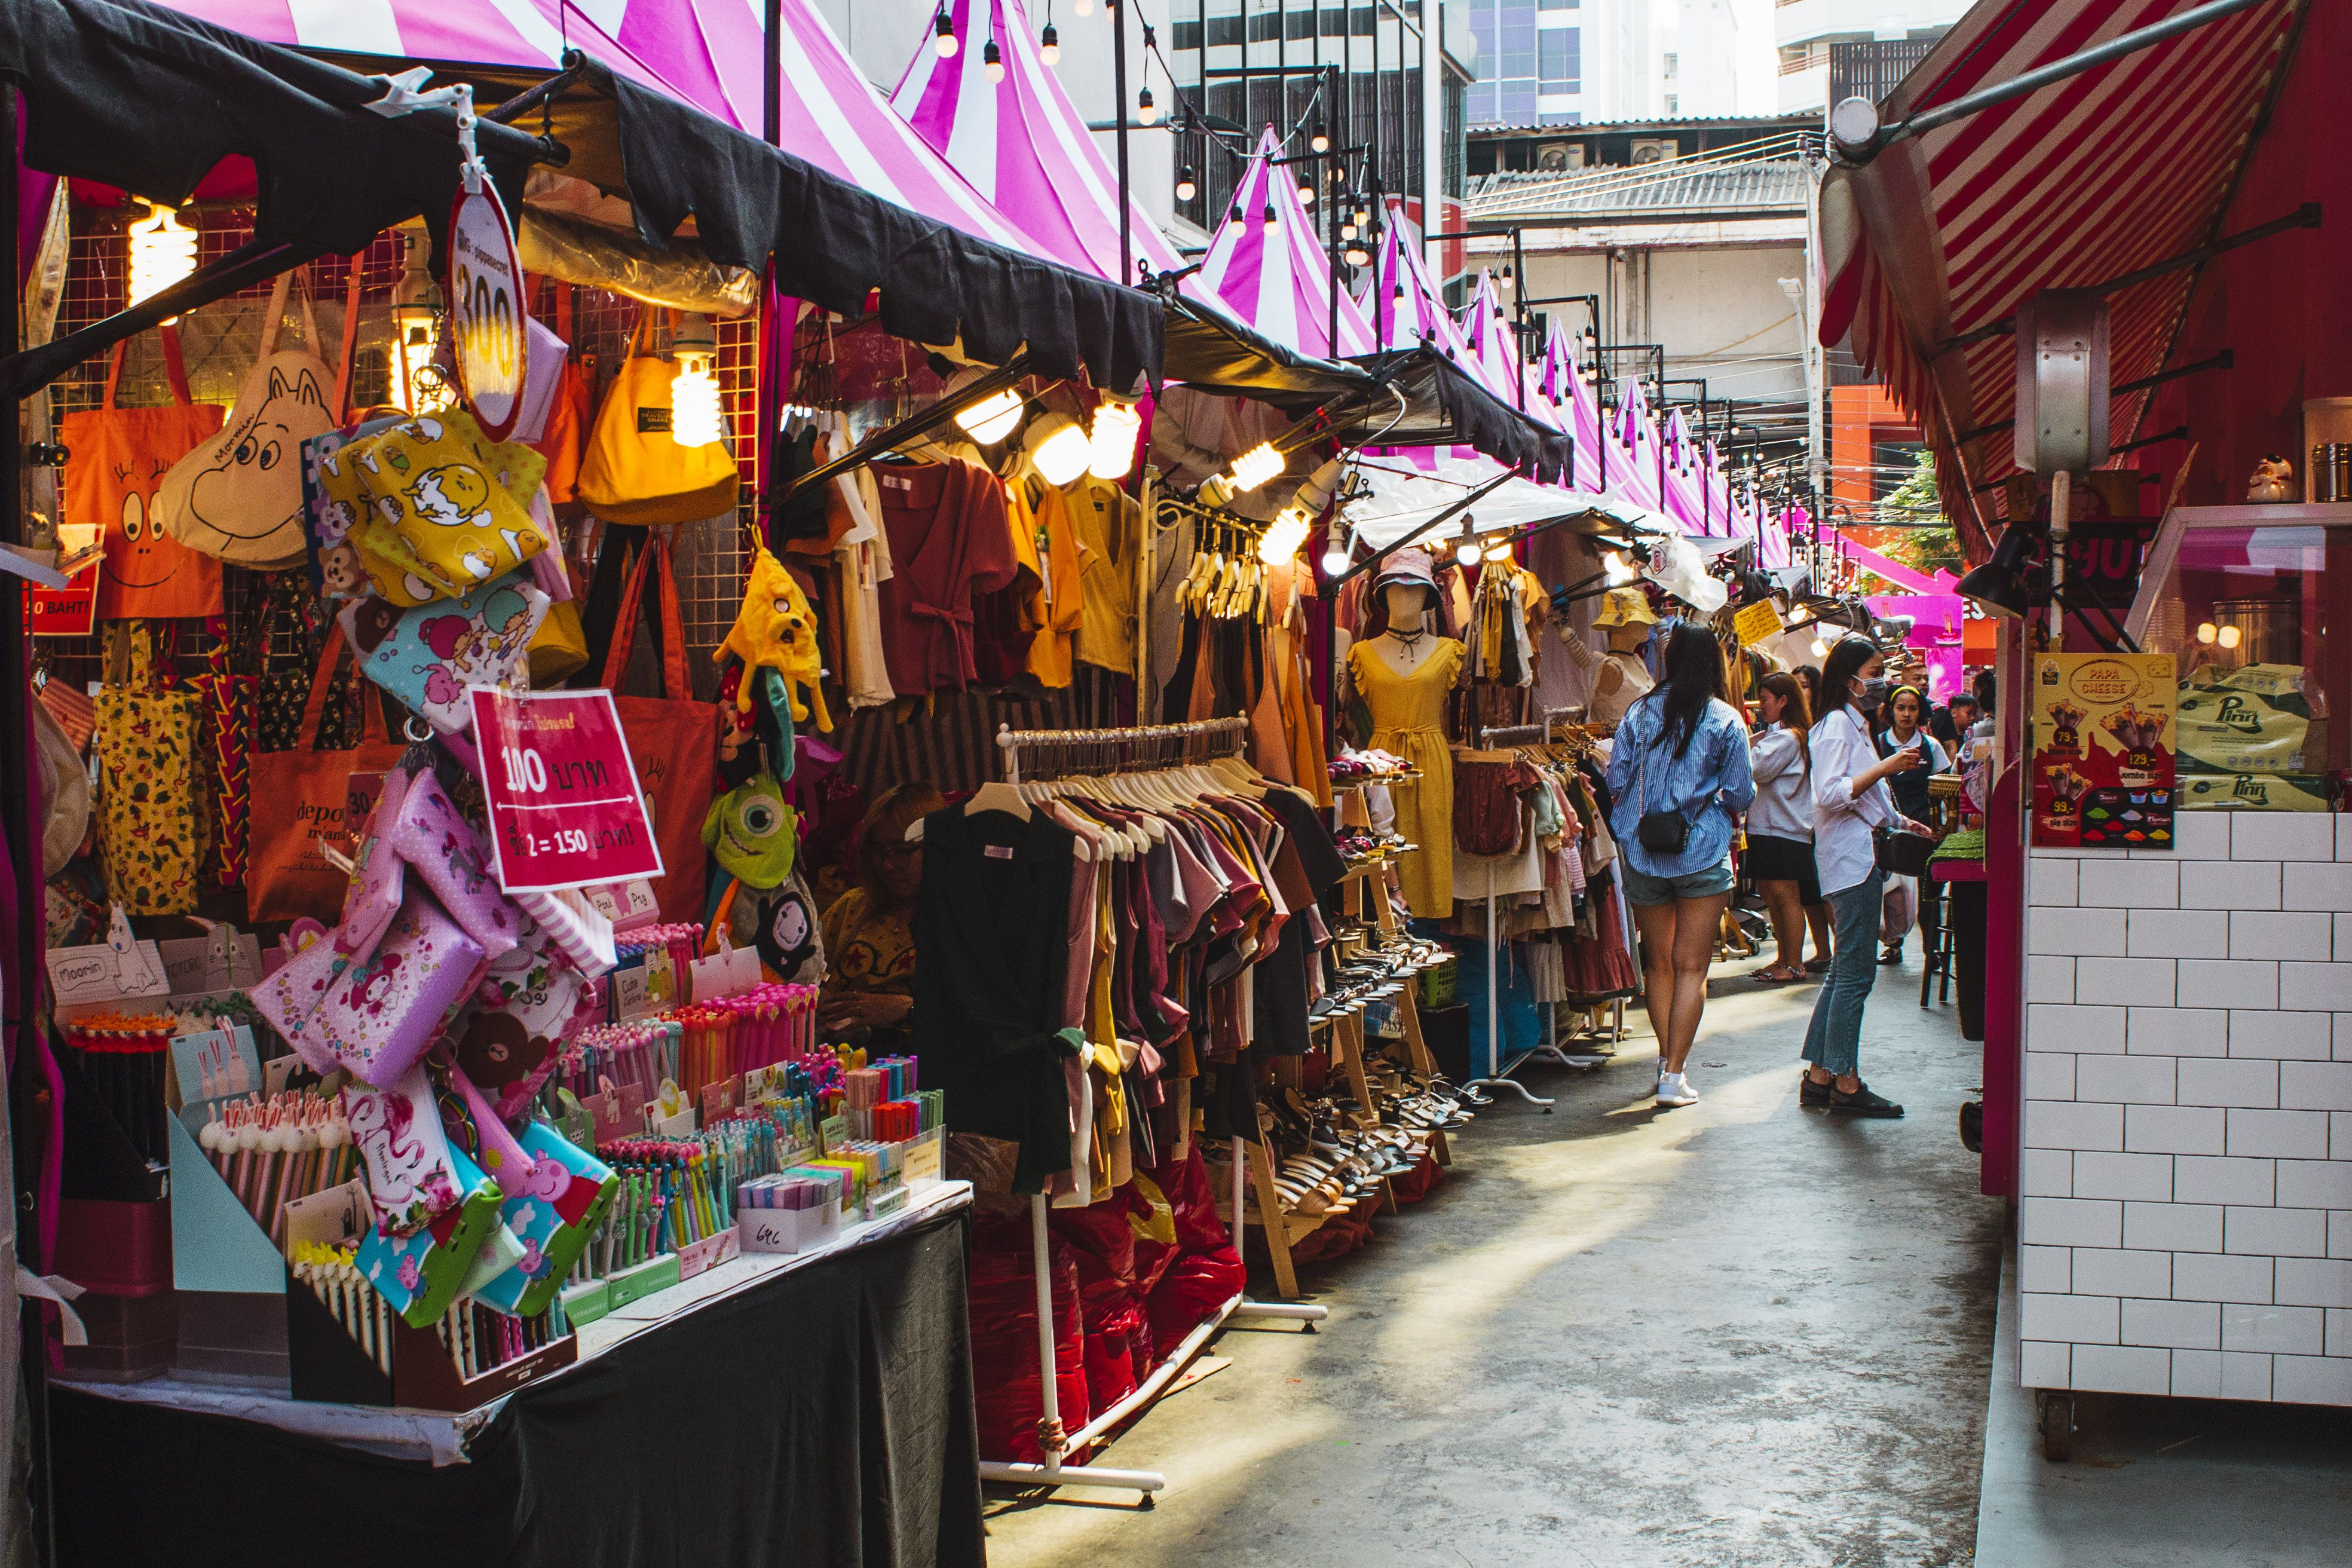 A street market in Bangkok